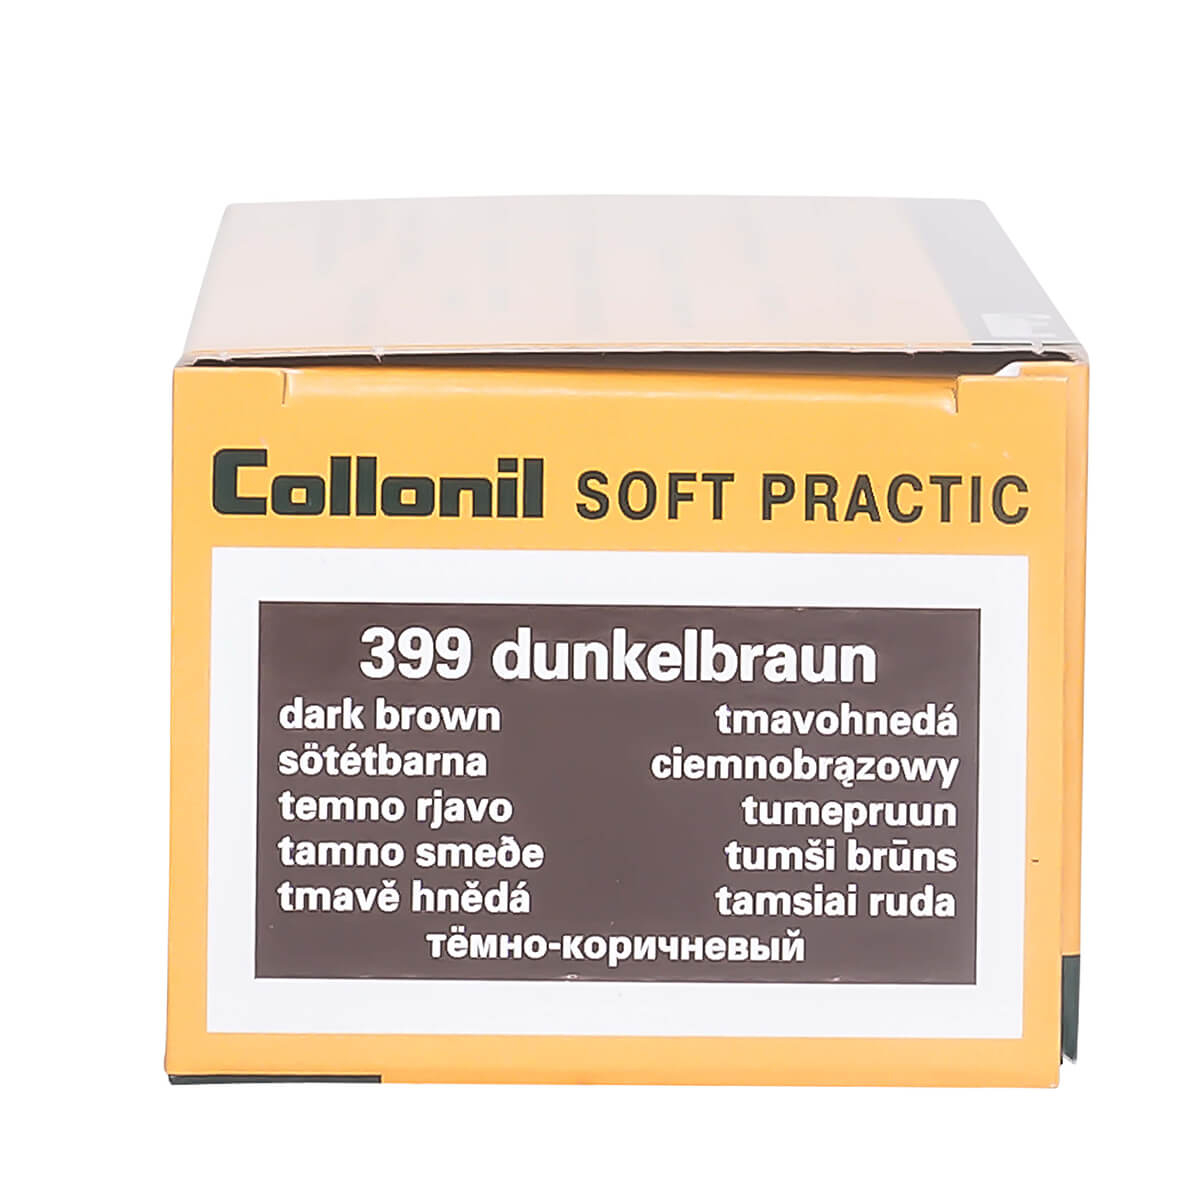 Collonil Creme  SOFT PRACTIC Dunkelbraun